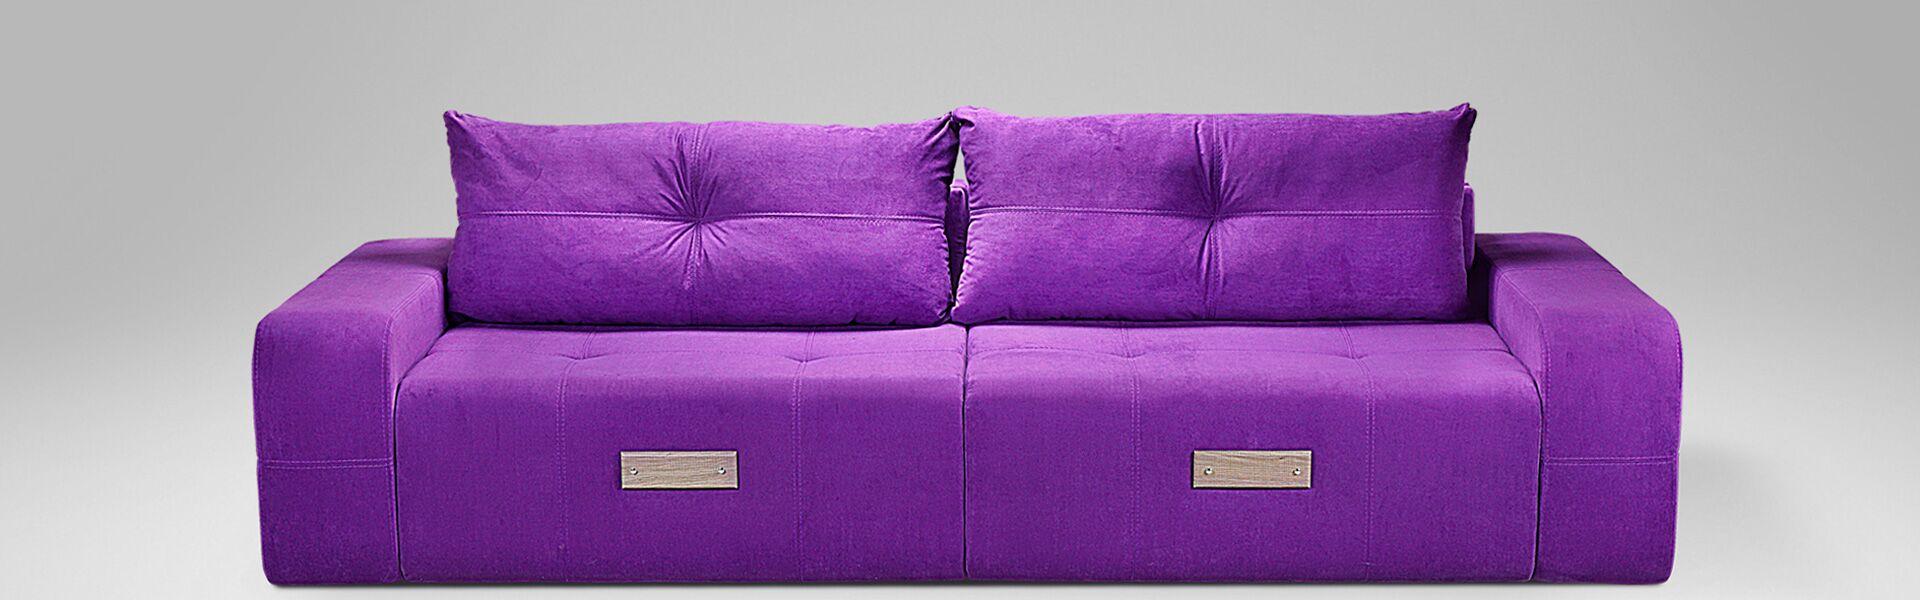 Знижки на дивани до 20%